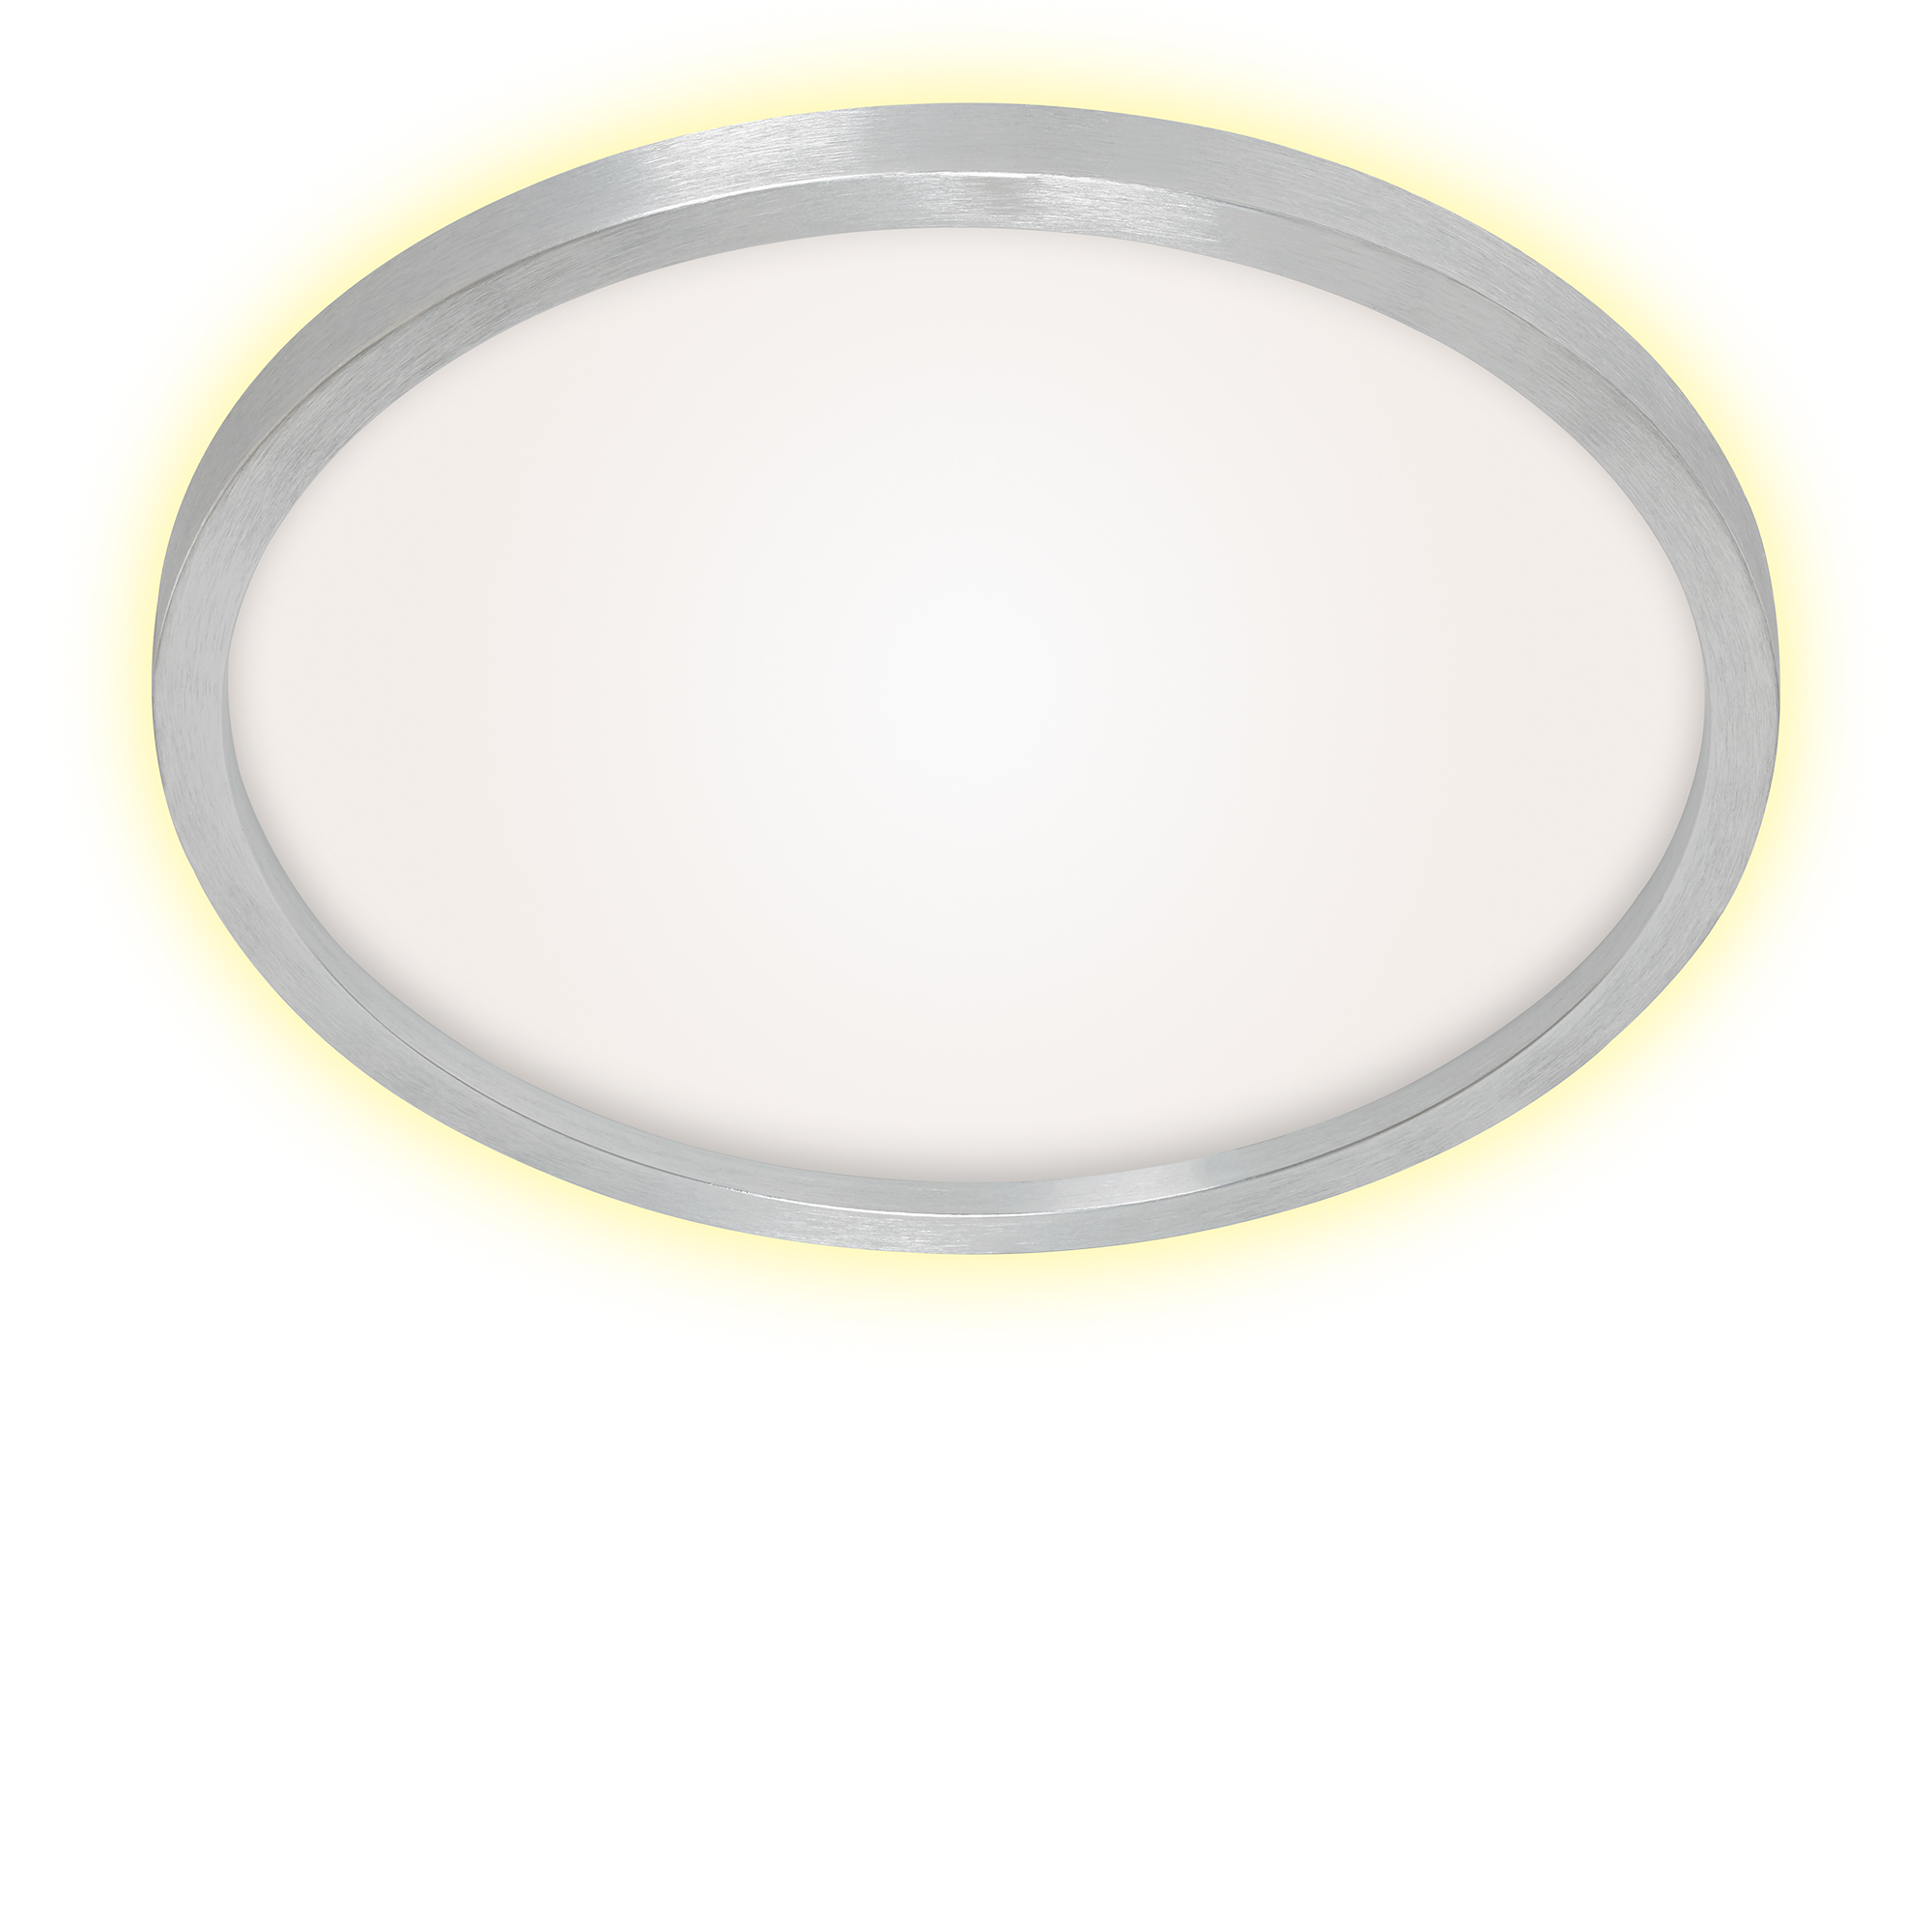 LED Panel, Ø 42,5 cm, 3000 LUMEN, 22 WATT, Alu